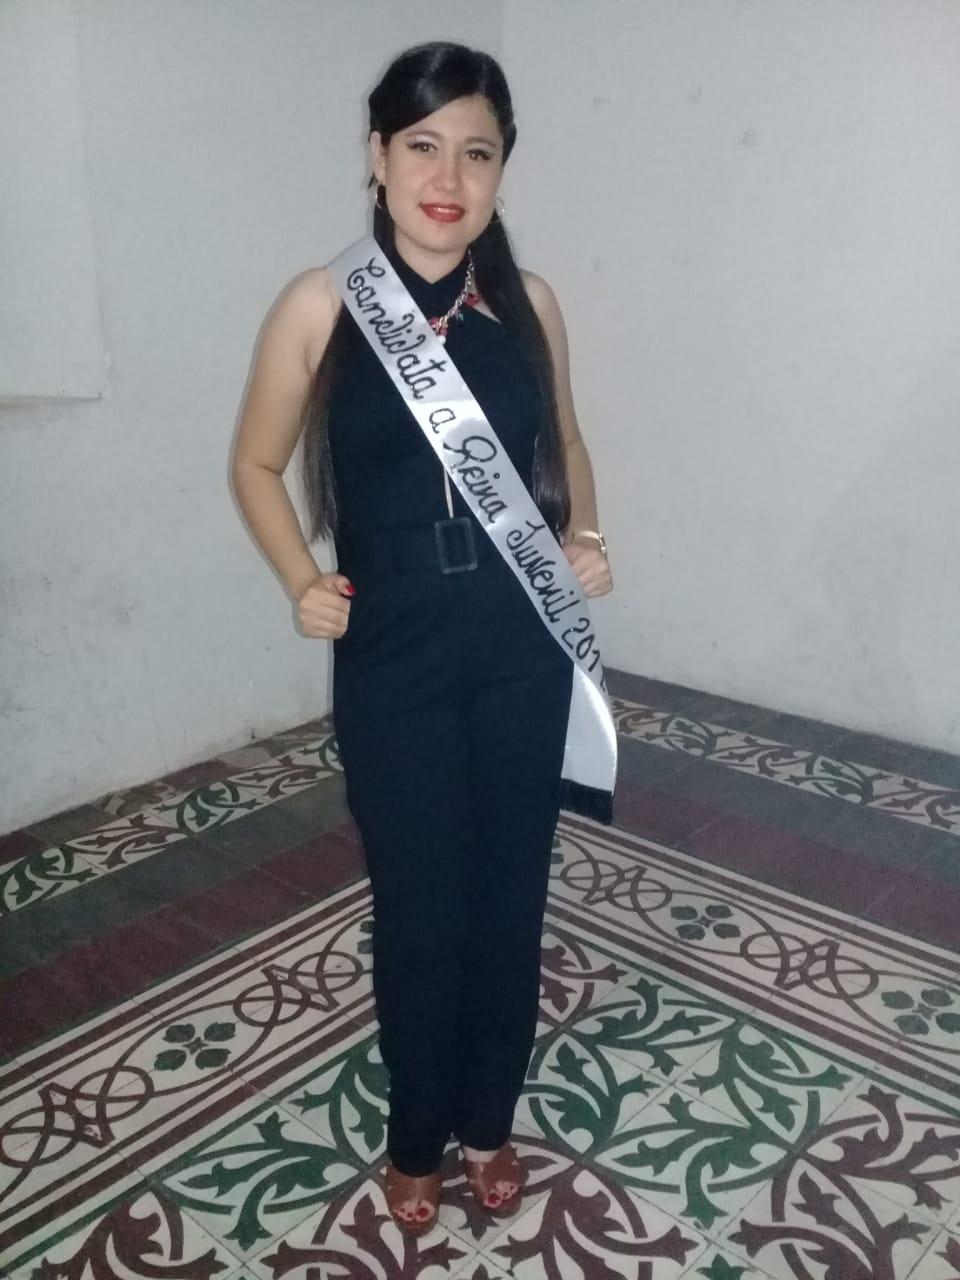 Jessy Nicolle Amador Montoya: Reina Juvenil 2019